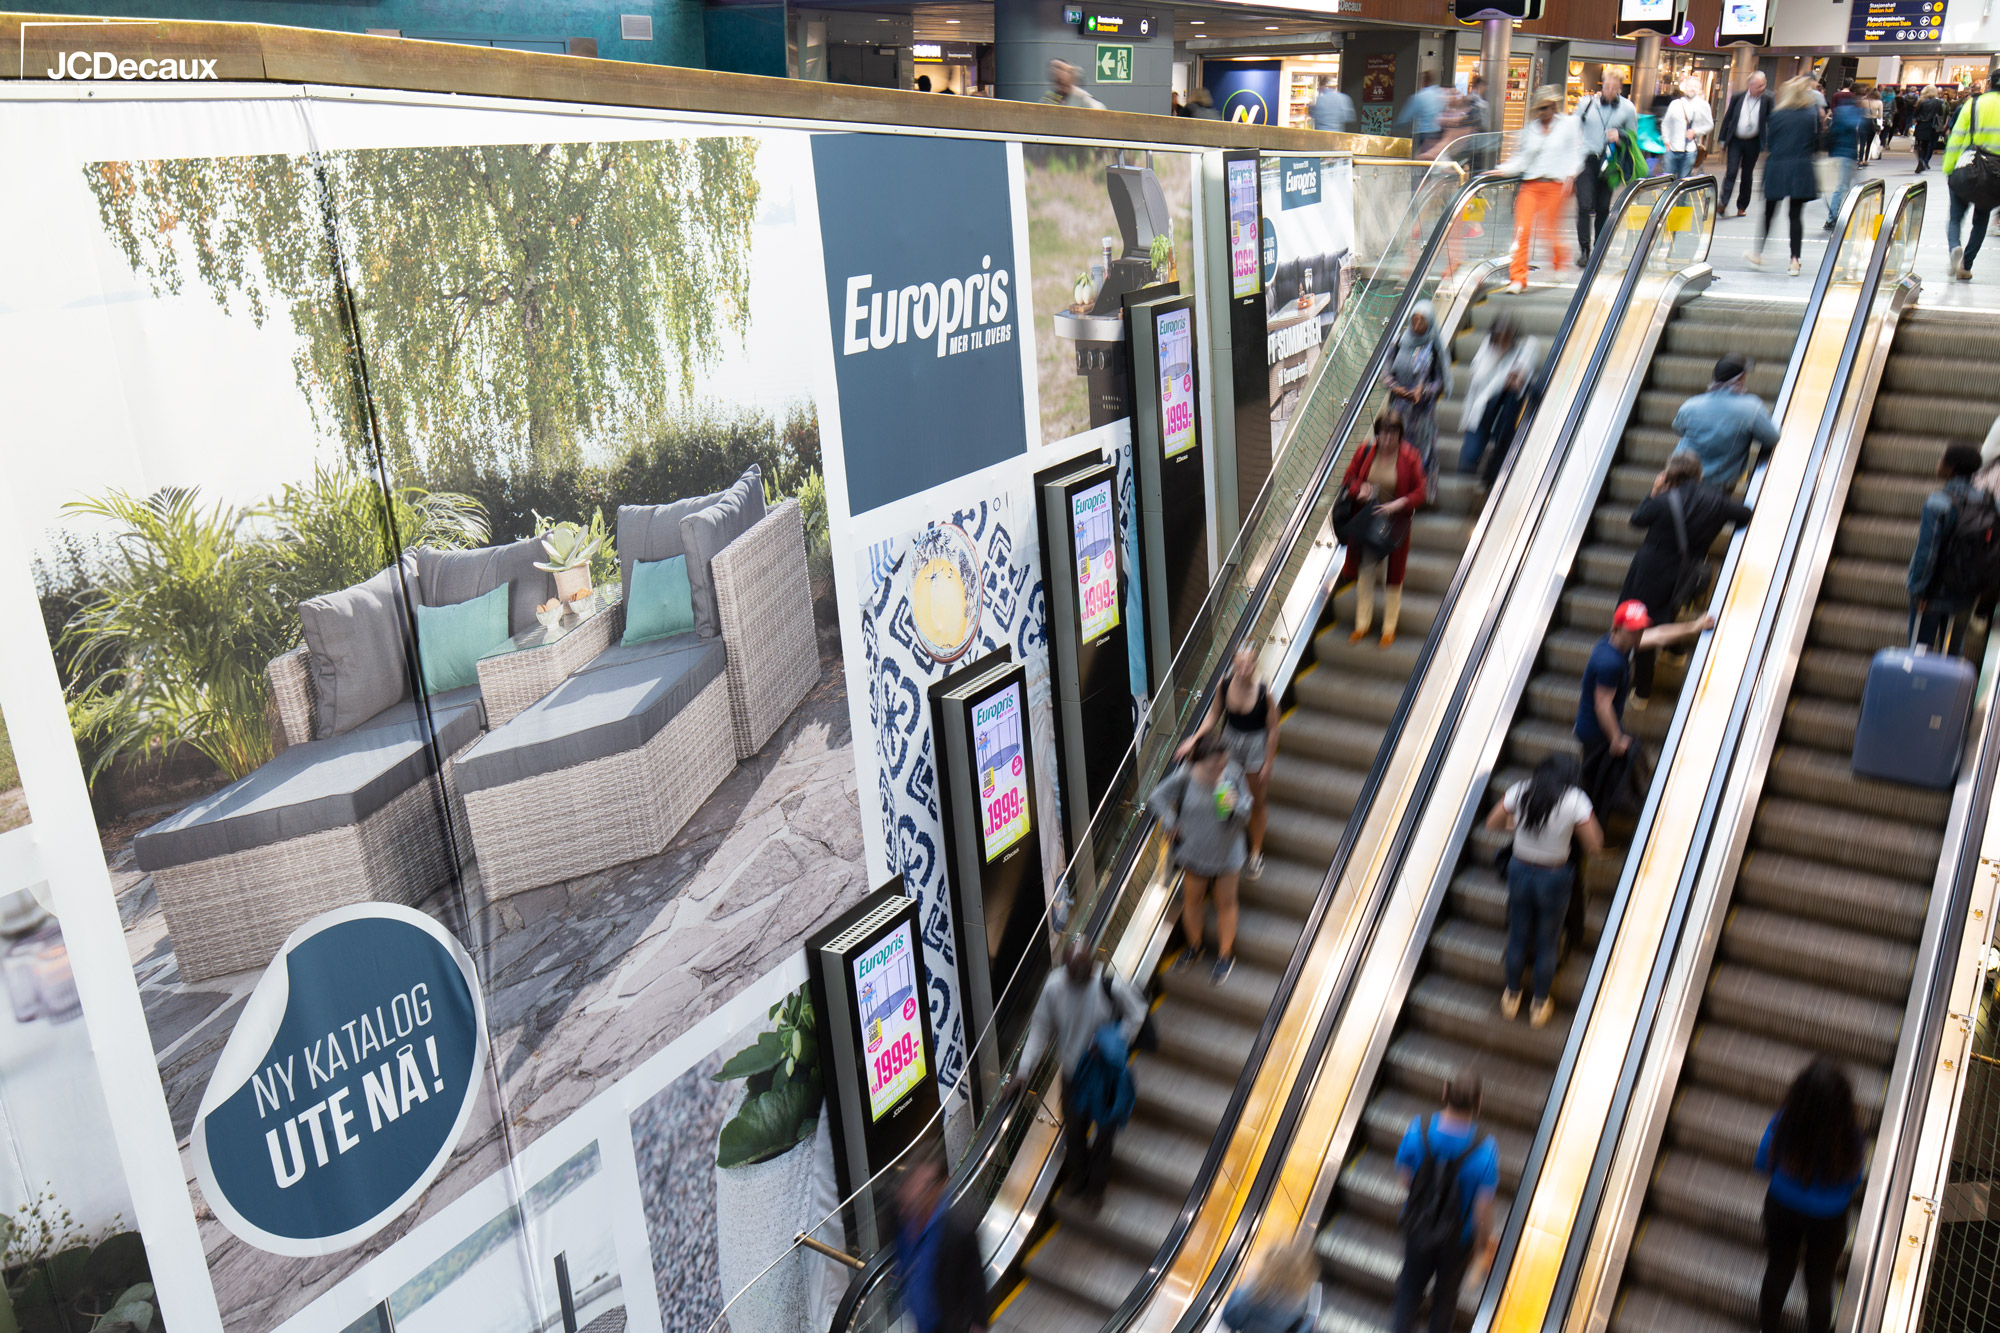 Europris-Escalator-Impact-Oslo-S-JCDecaux(5)